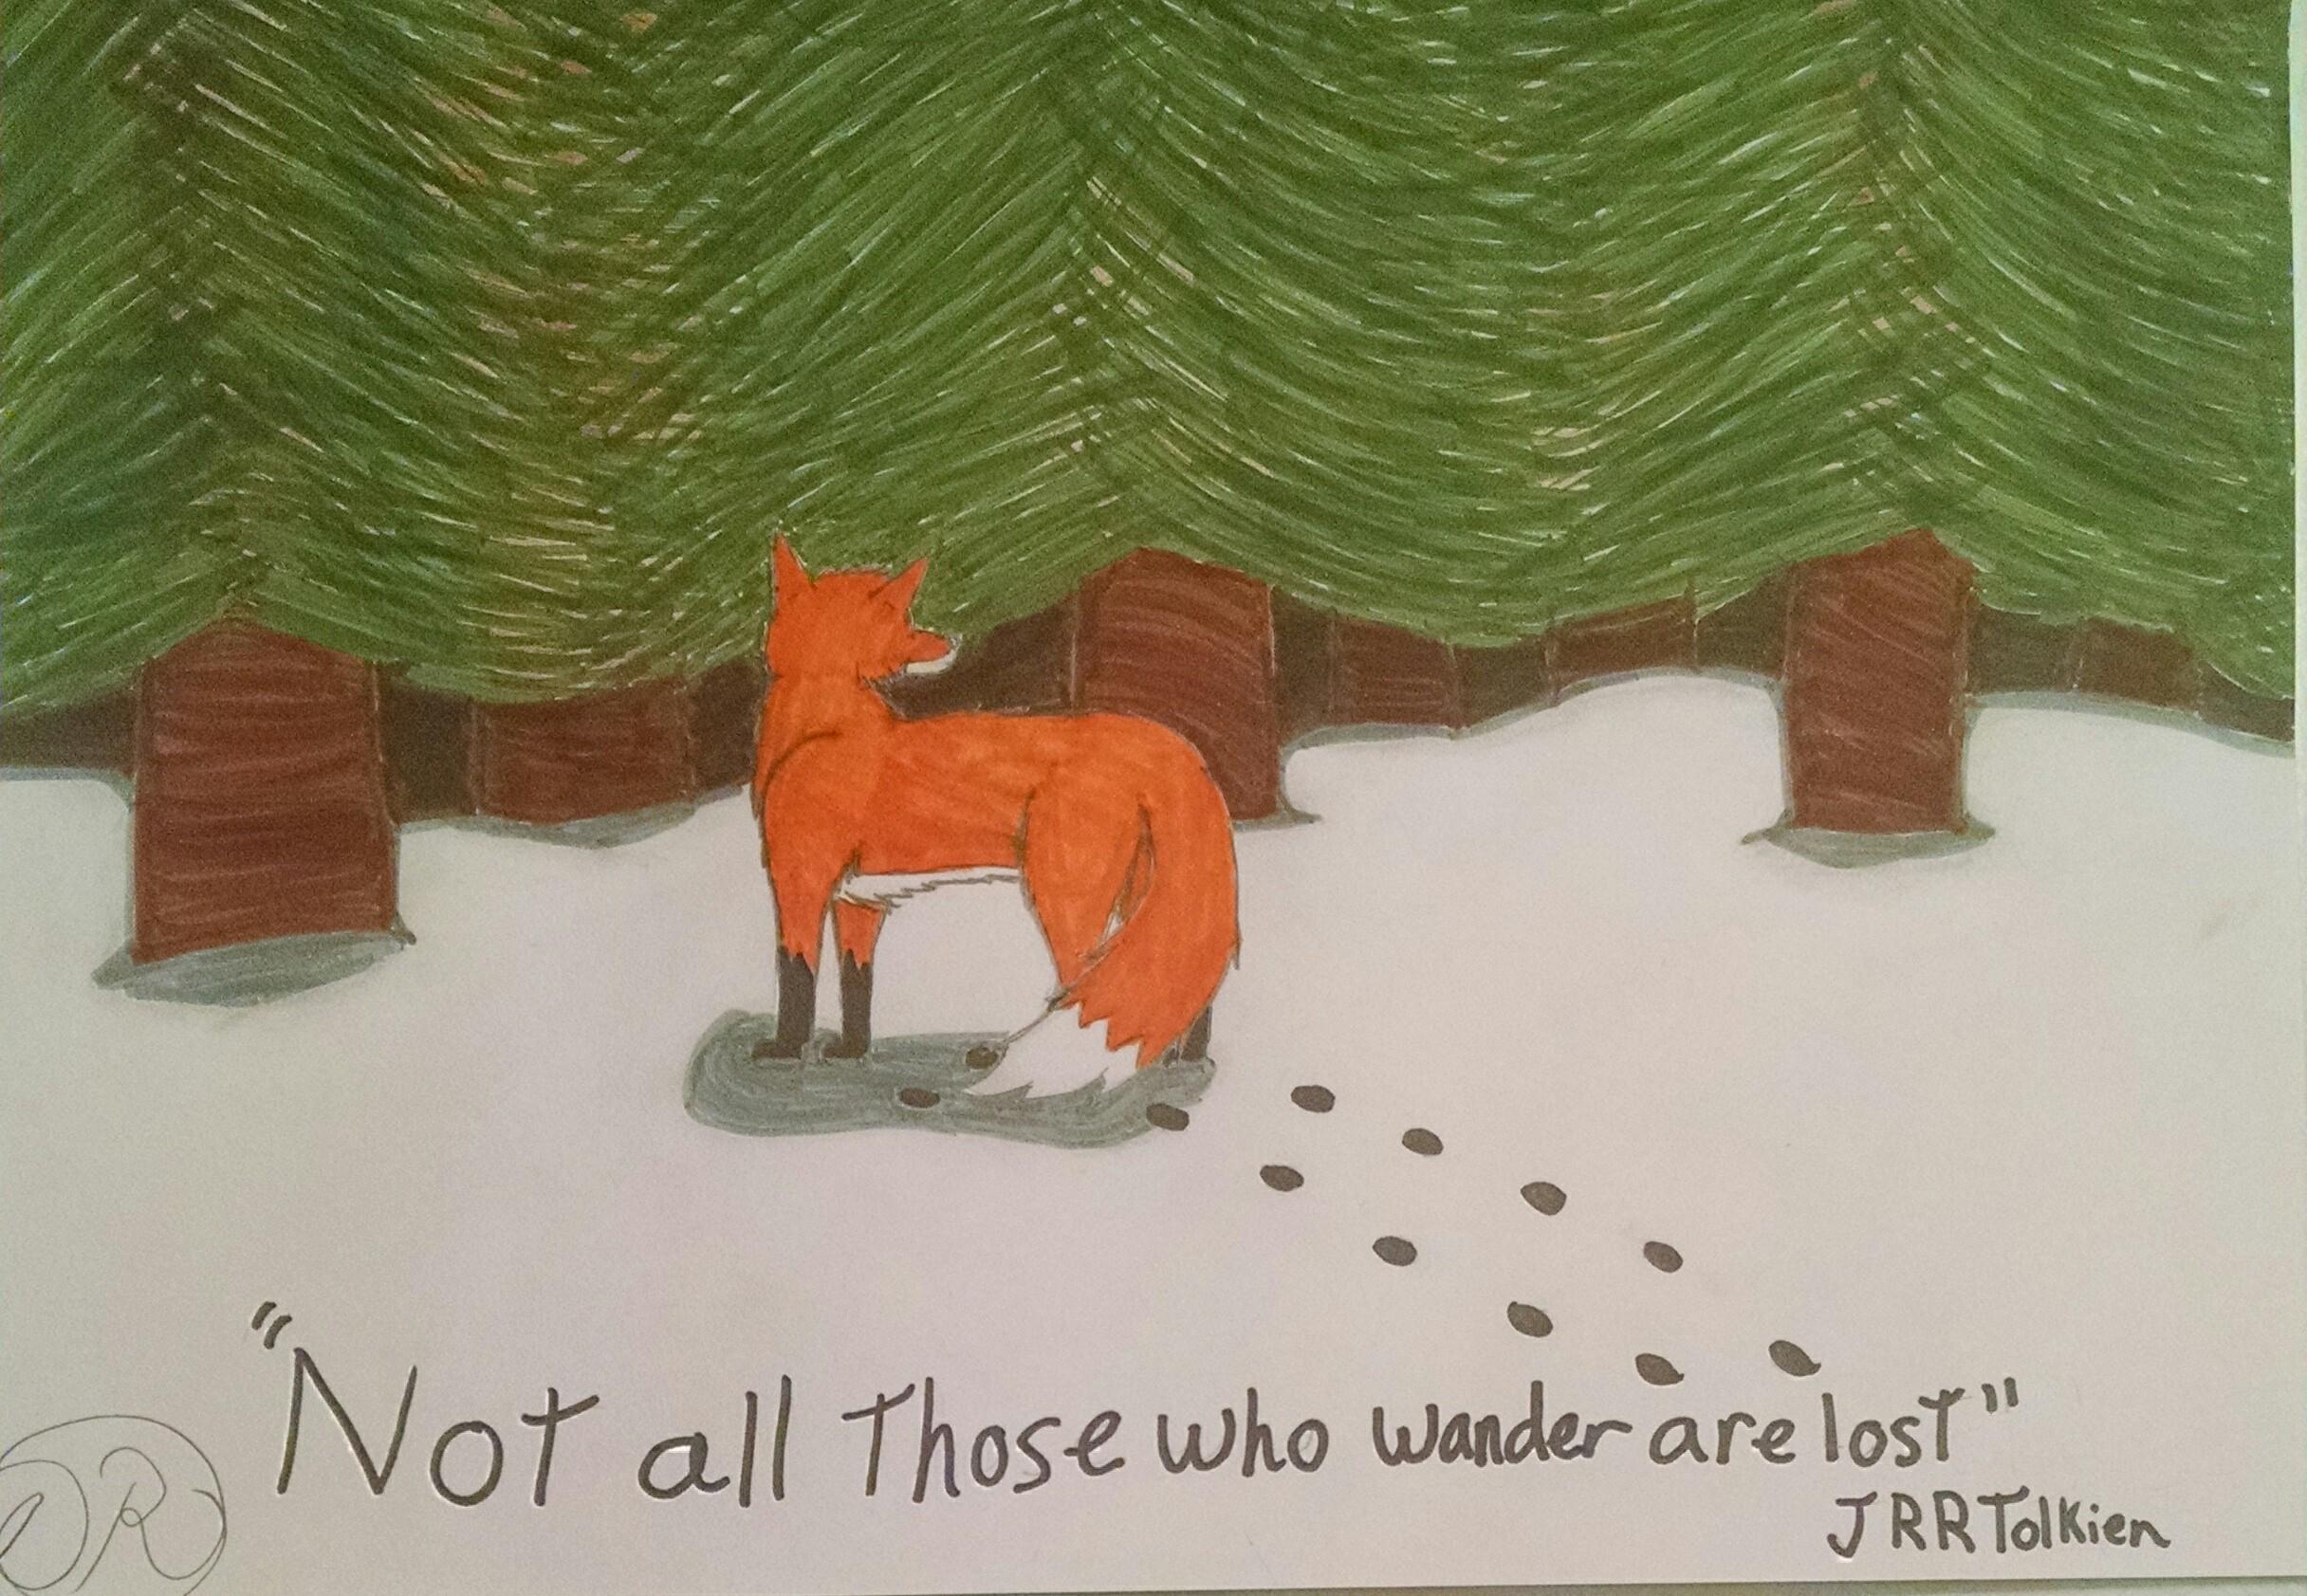 Fox in the woods by DestinyRider